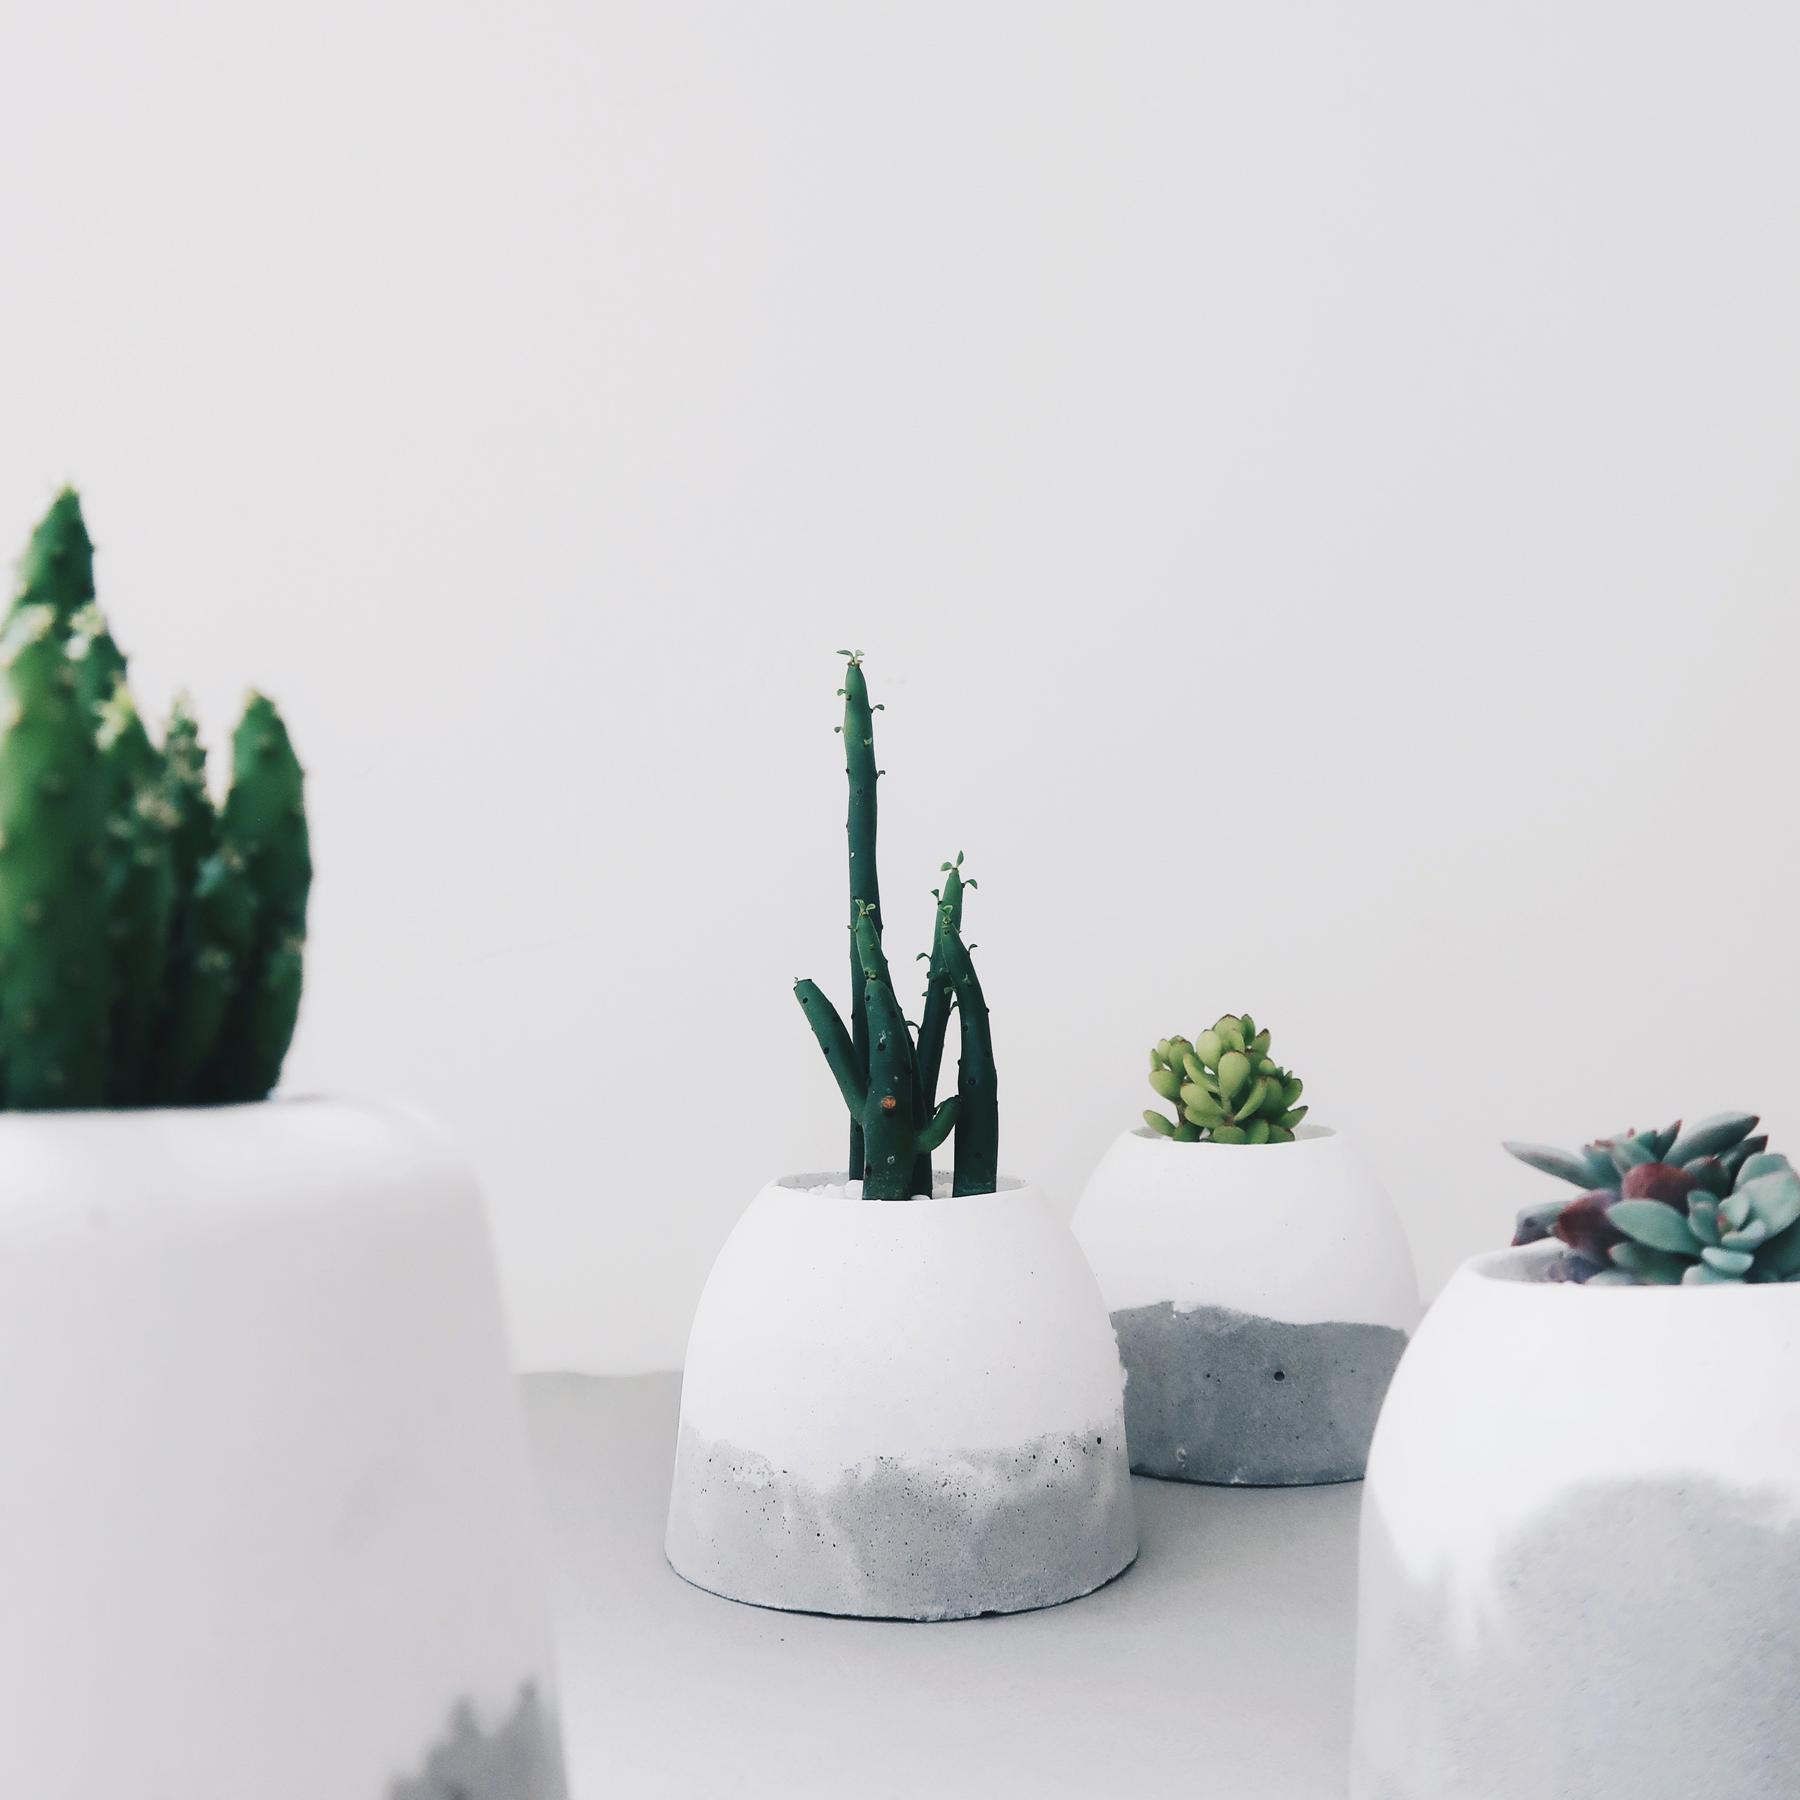 HILL ISLAND 小島山仙人掌雪景水泥盆栽